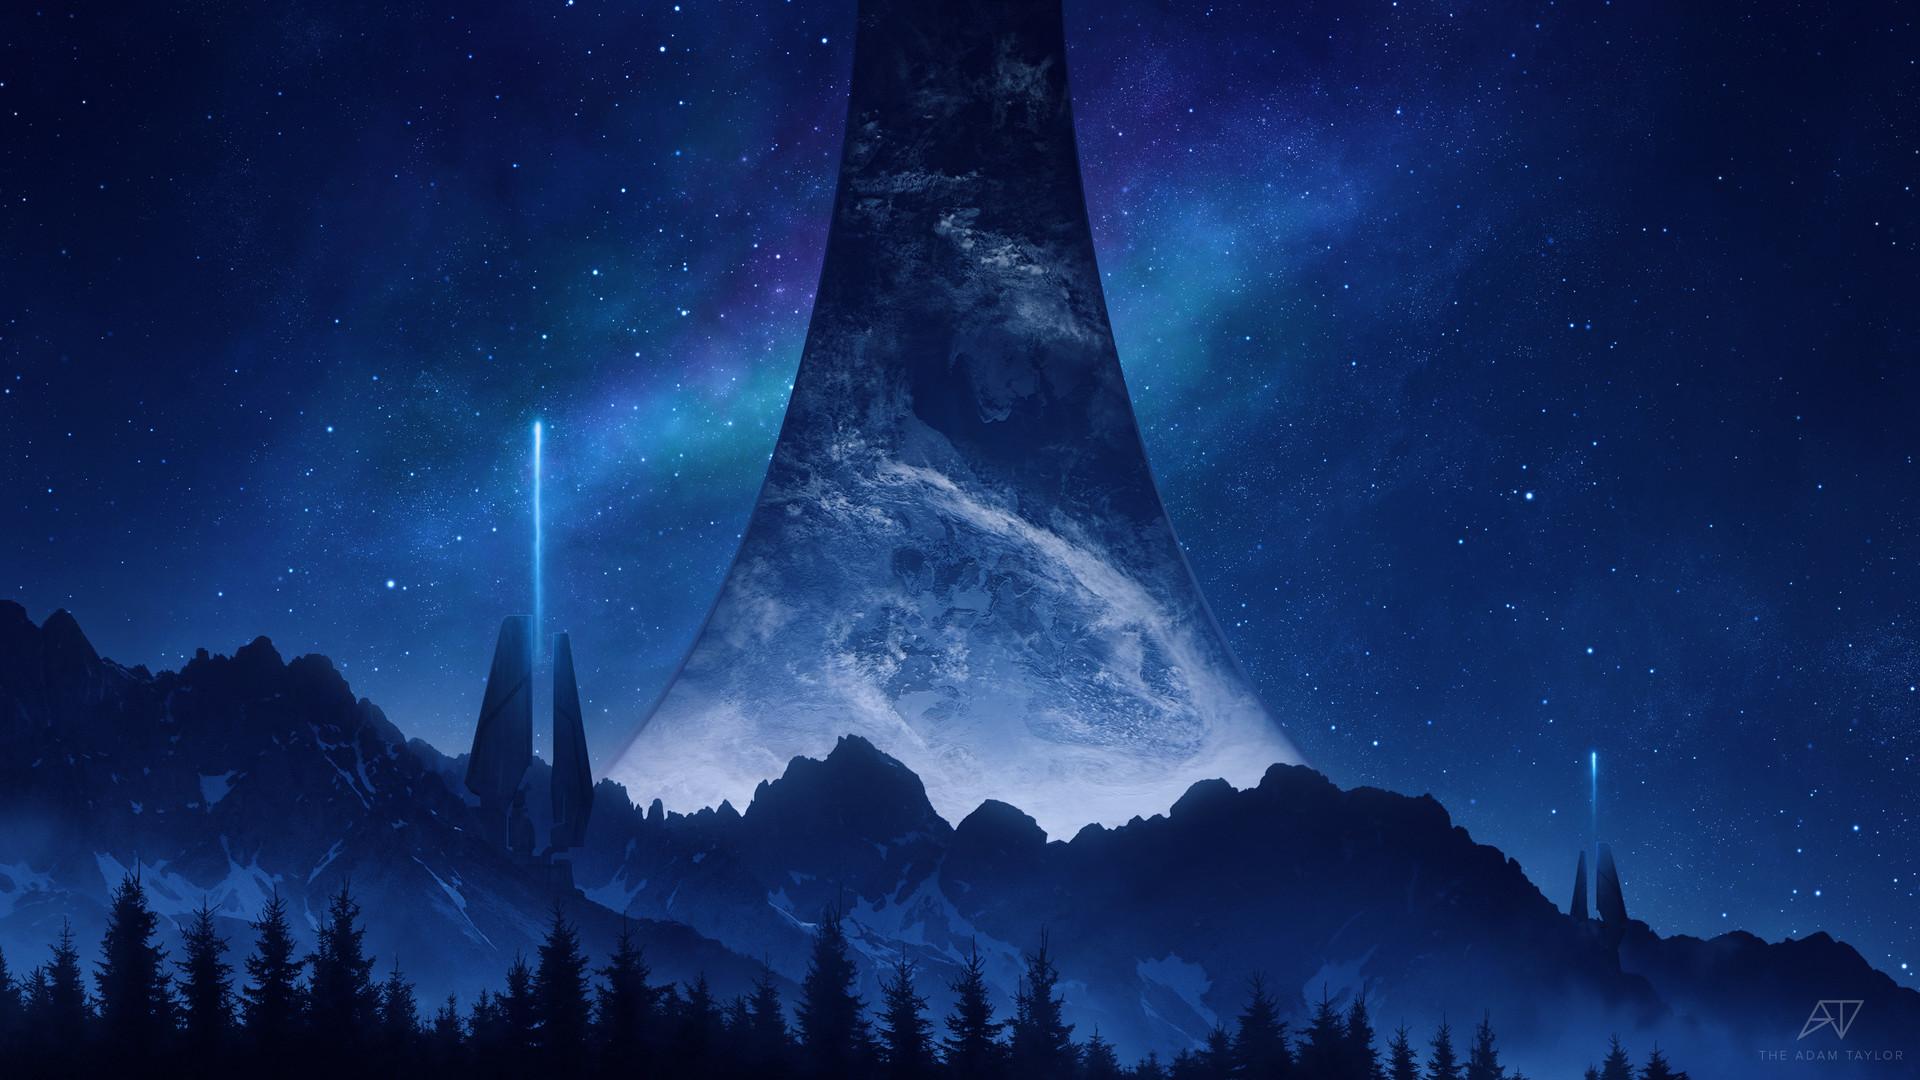 adam-taylor-halo-infinite-into-the-night-with-logo.jpg